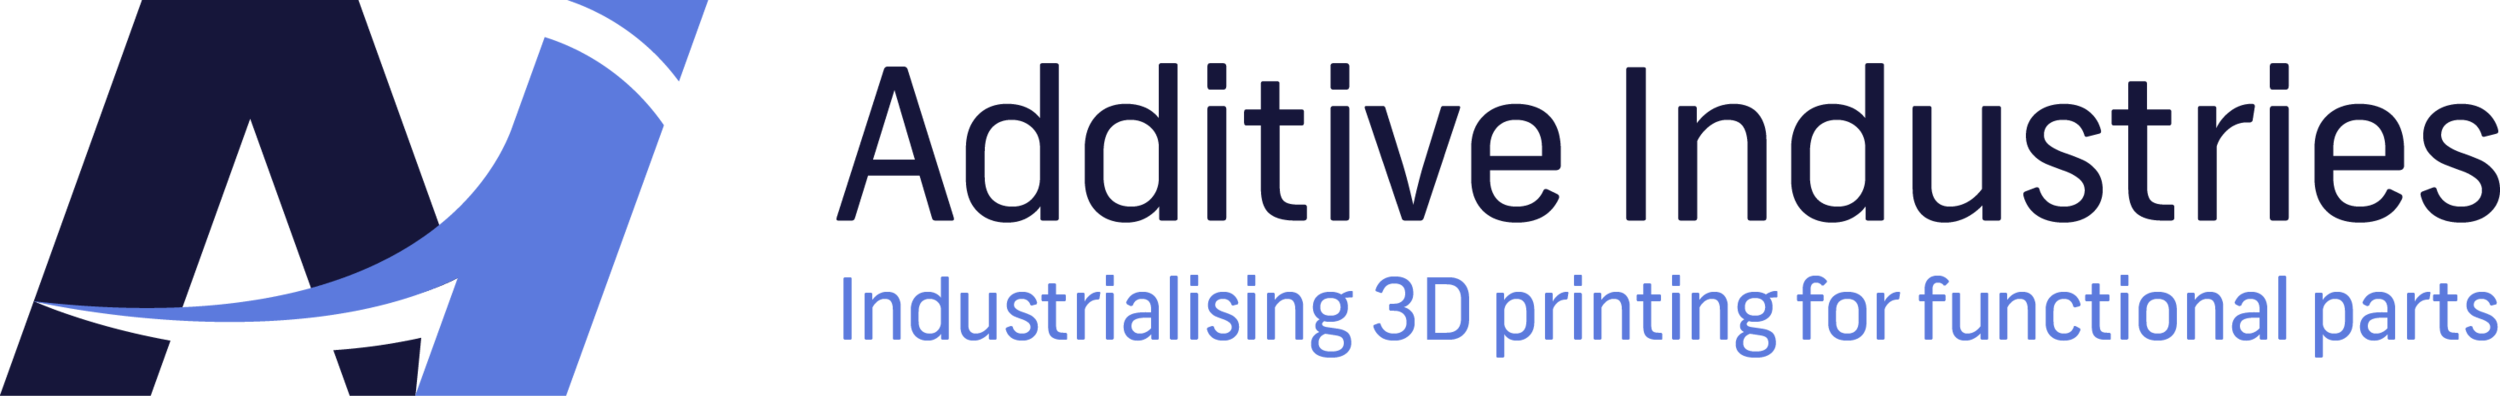 additive_idustries_logo.png